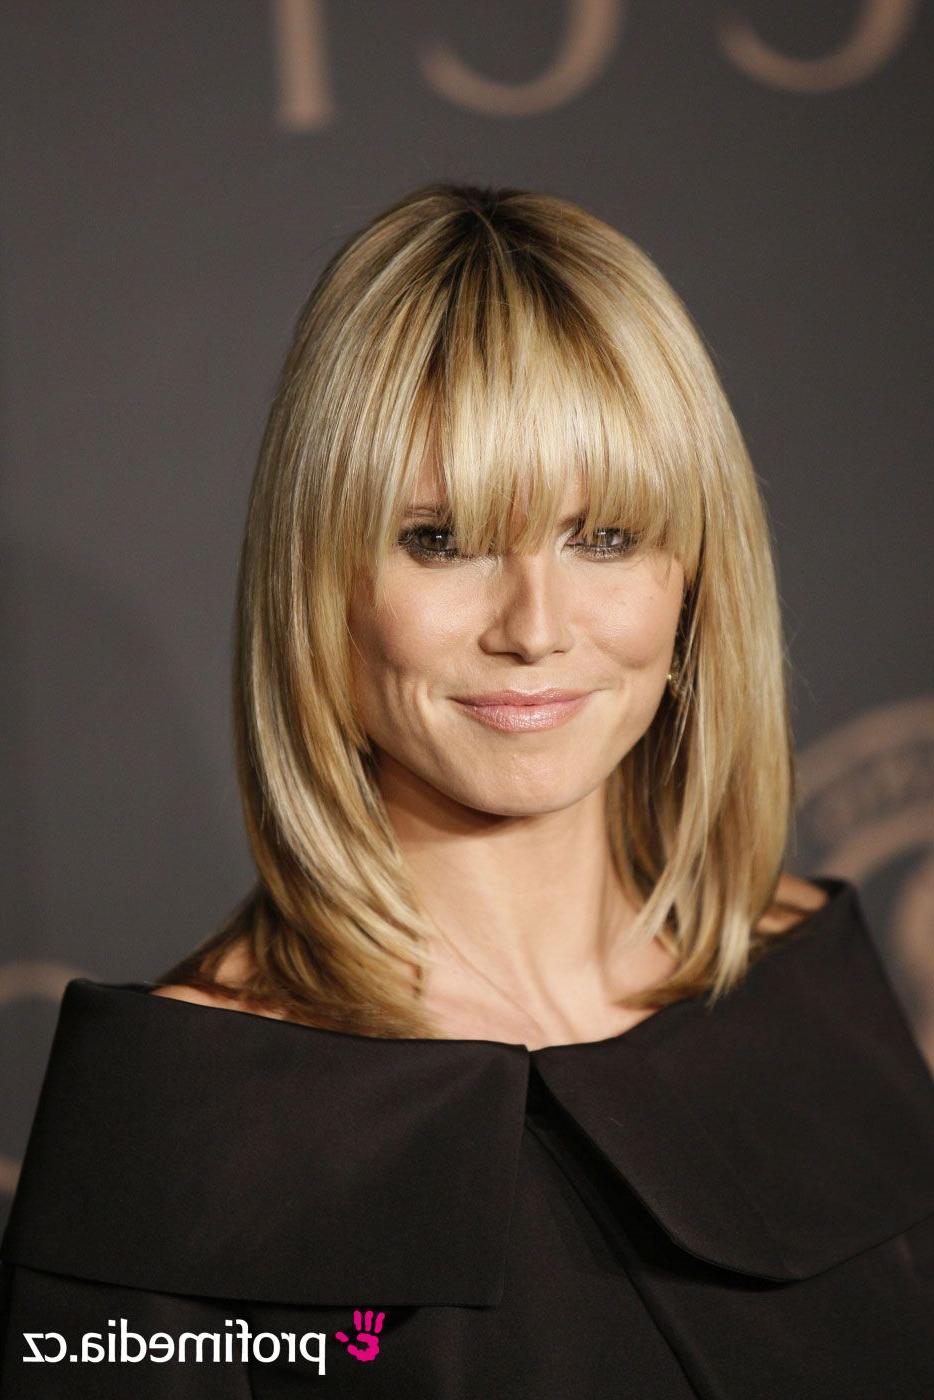 Heidi Klum – – Hairstyle – Easyhairstyler | Hair Style & Makeup Regarding Heidi Klum Short Haircuts (View 16 of 25)